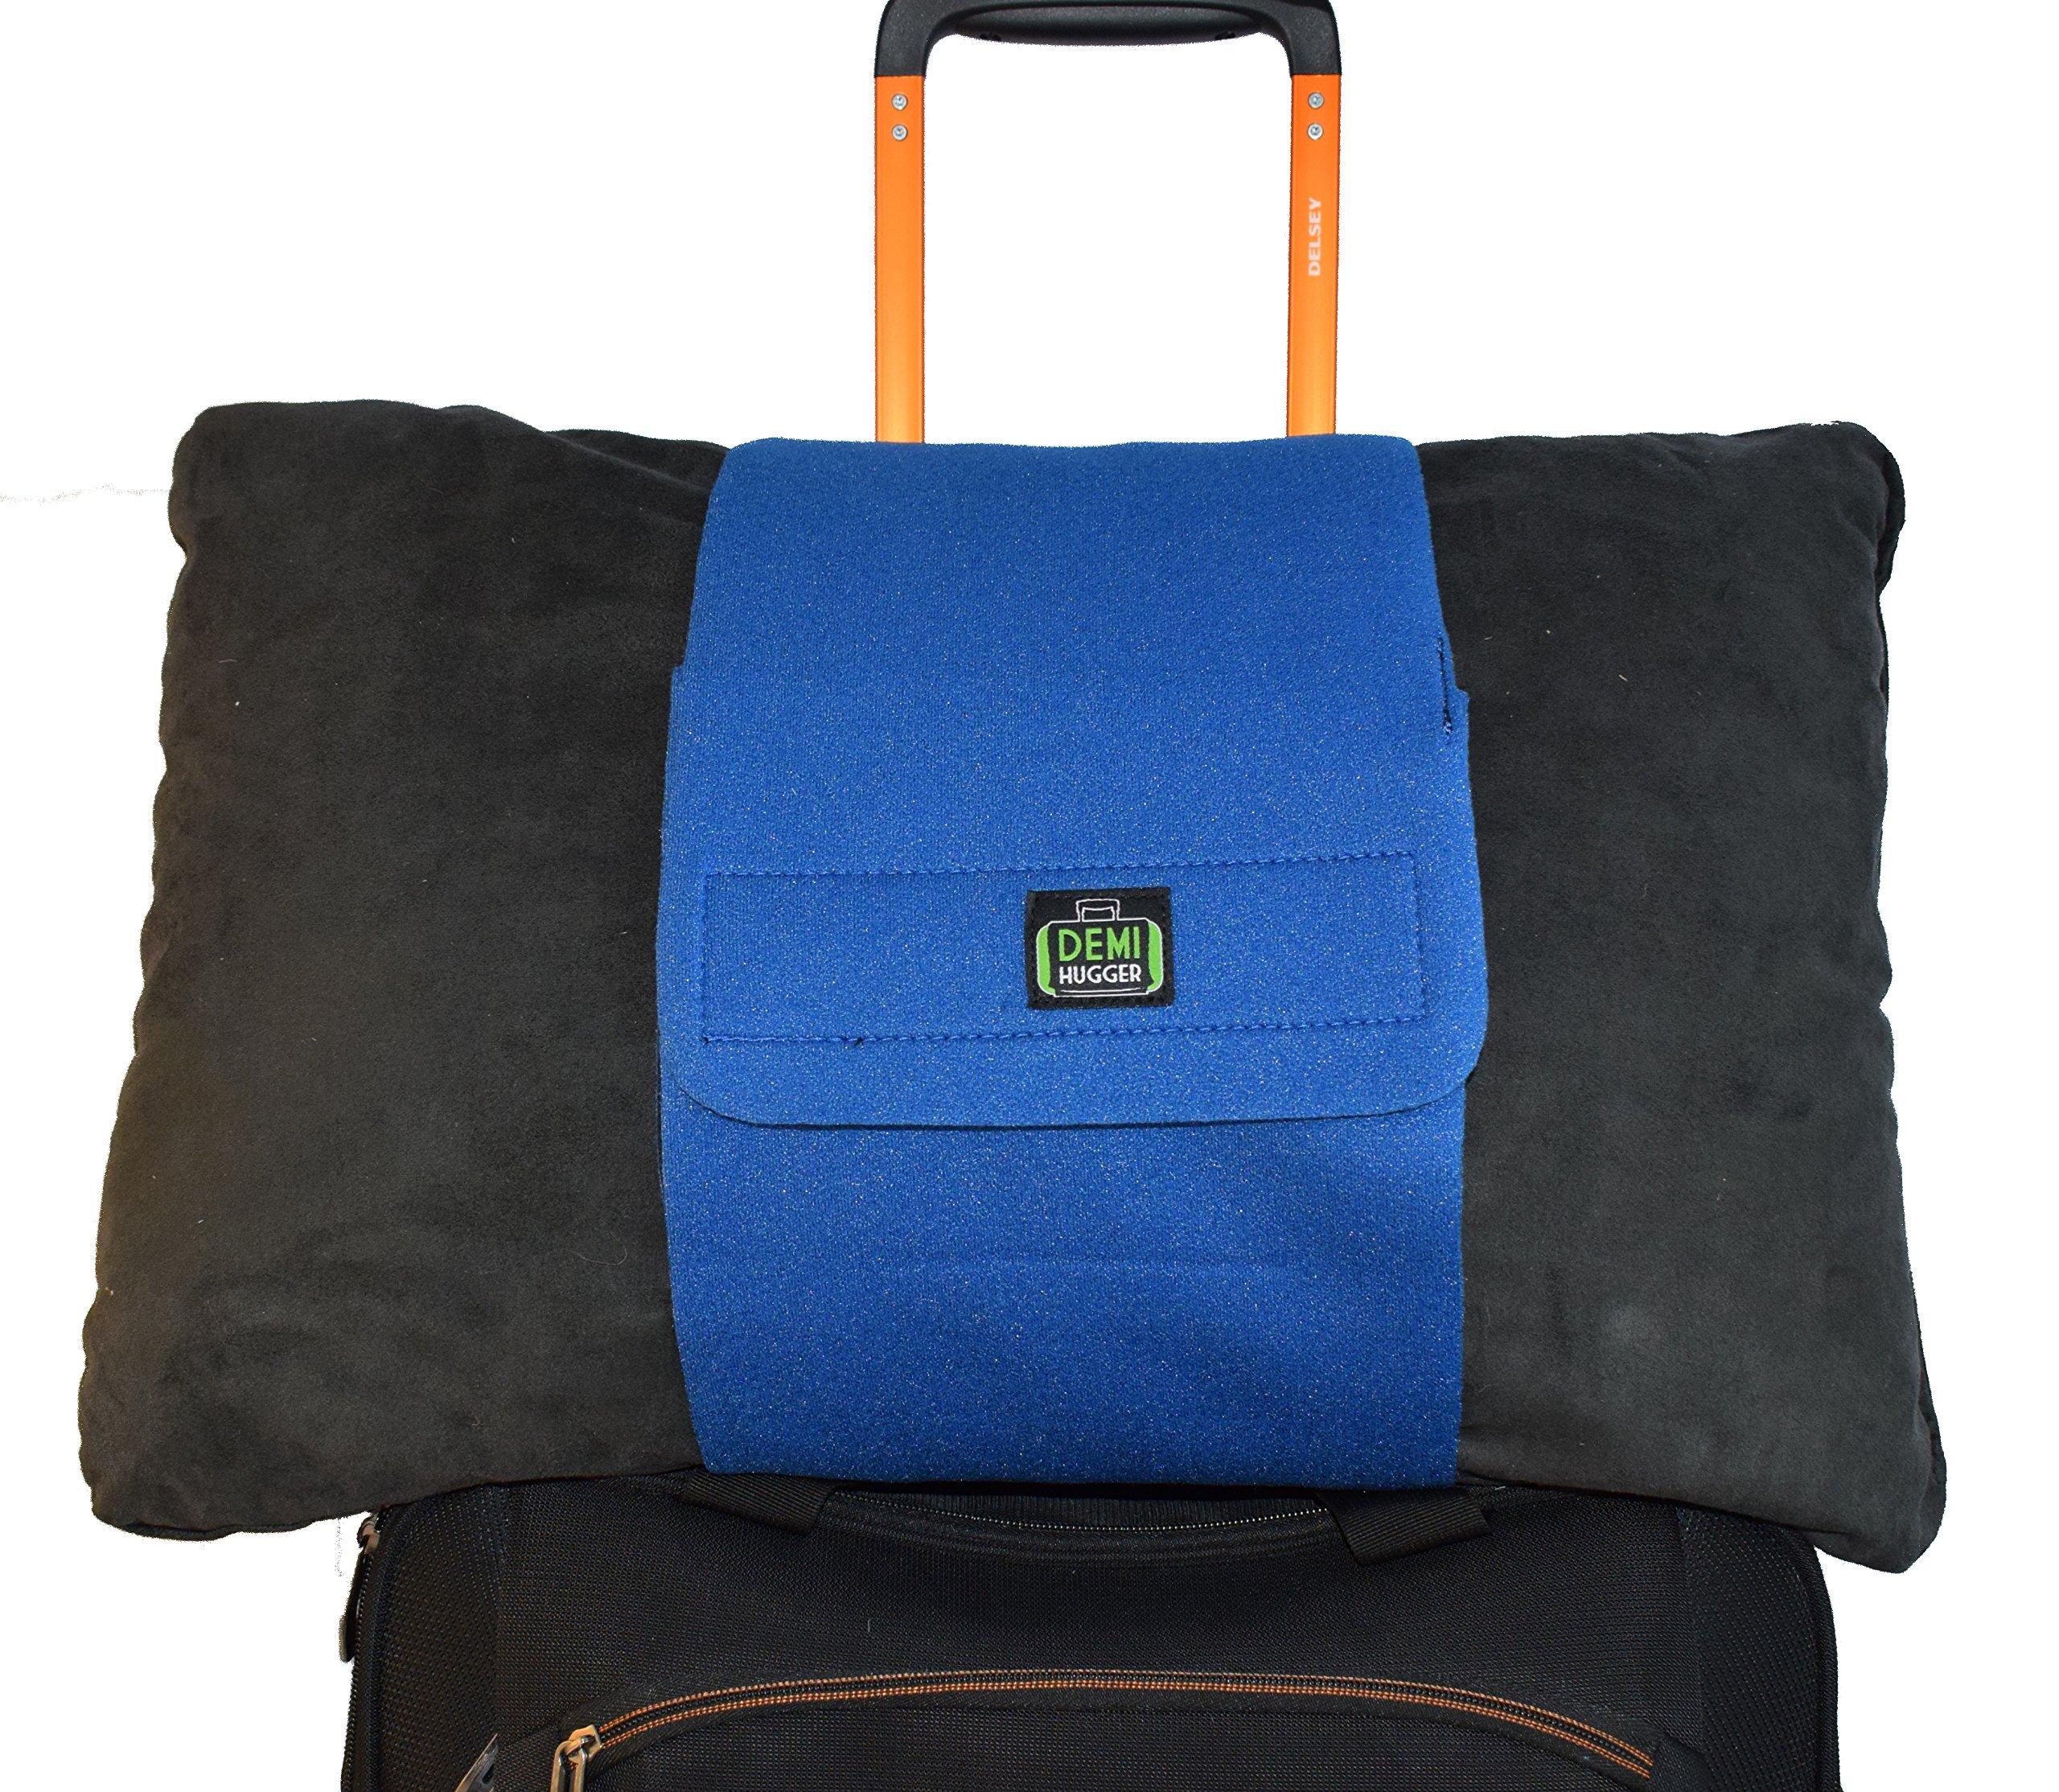 Demi Hugger Travel Luggage Strap (Blue)